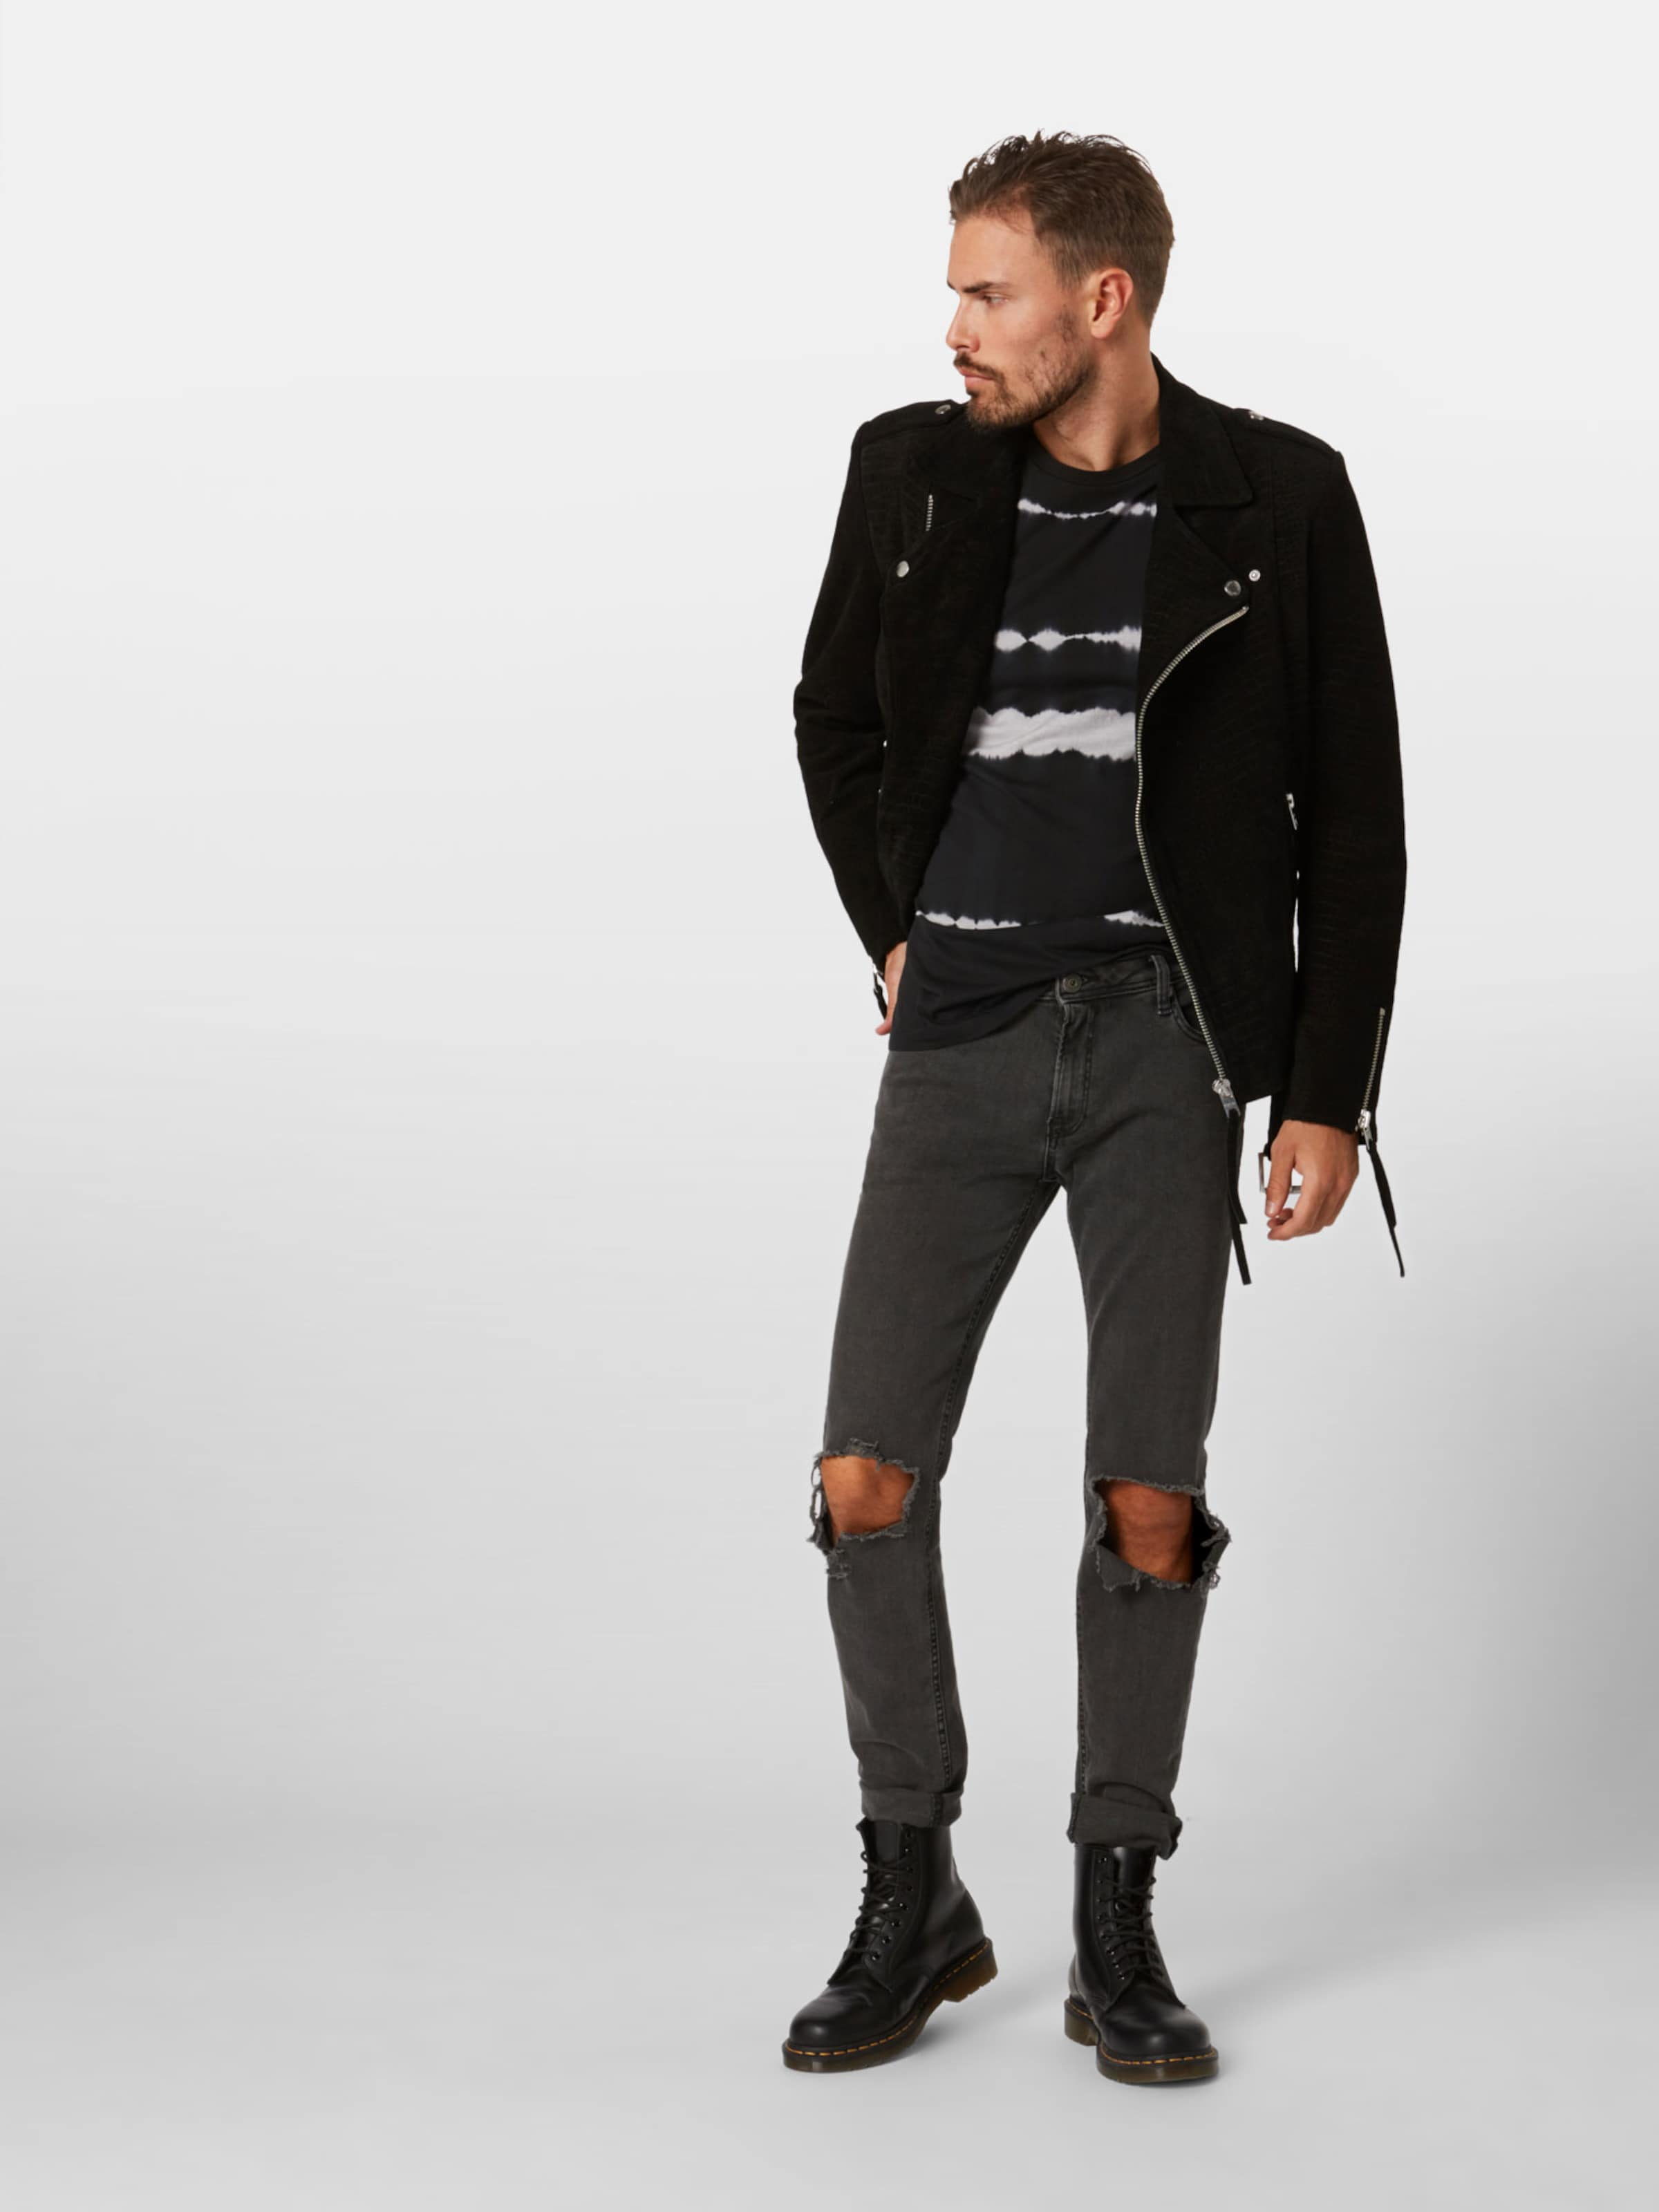 Jackamp; Shirt Jones 'joralbert' SchwarzWeiß In shQtCrd